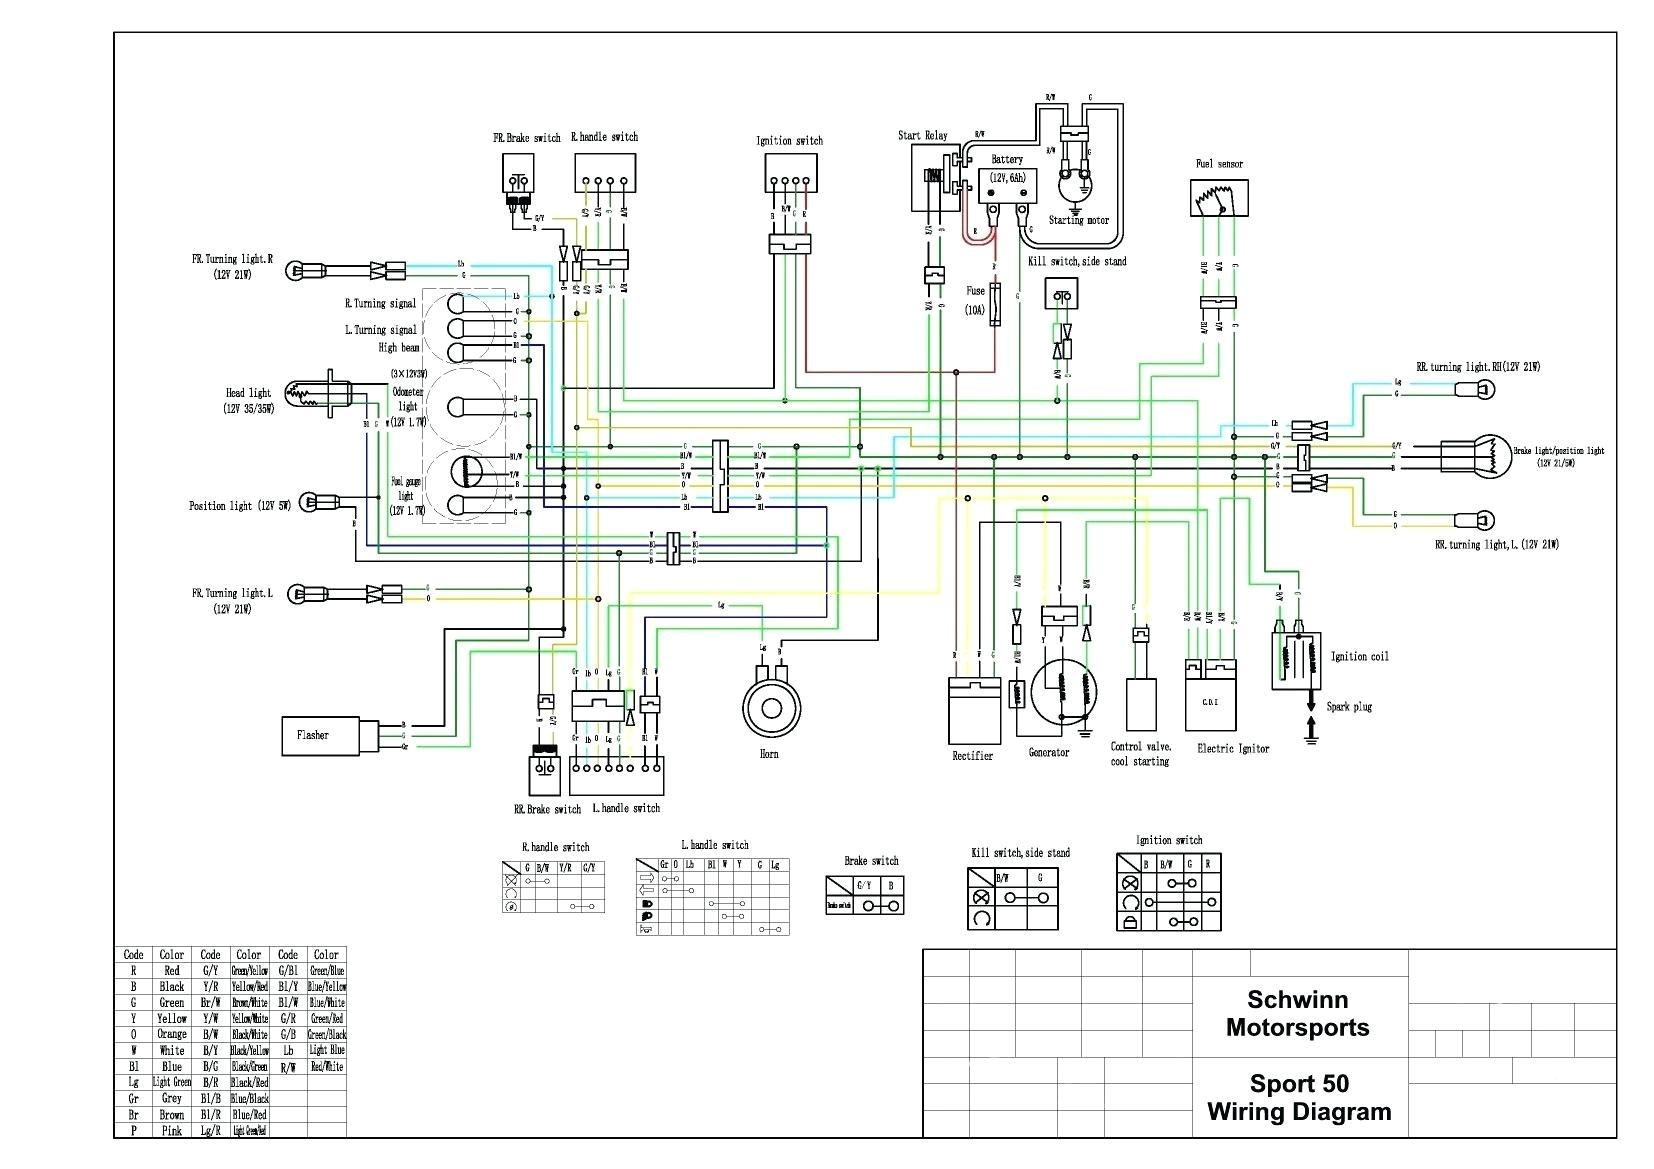 2012 Taotao 50cc Scooter Wiring Diagram Taotao Scooter Wiring Diagram Wiring Diagram Info